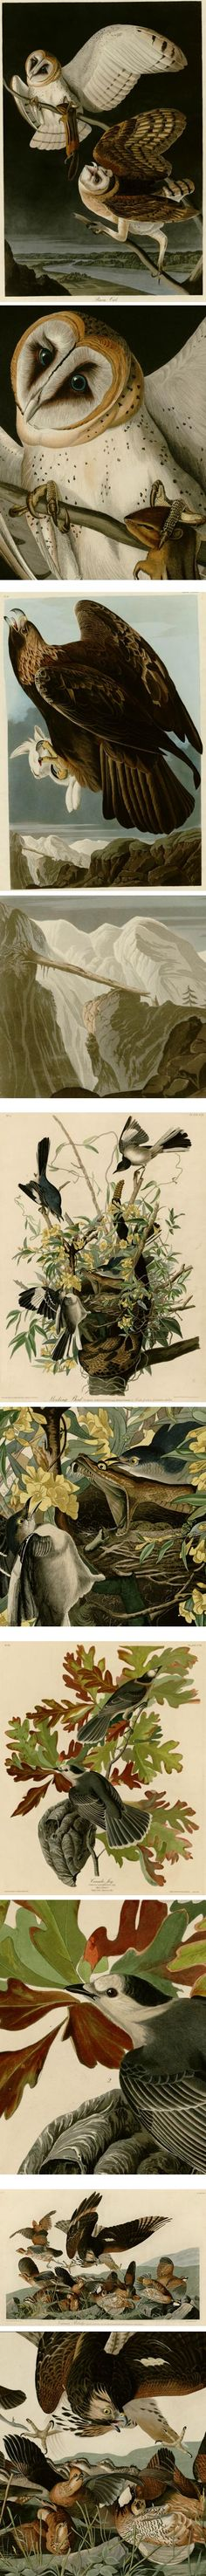 John James Audubon, Birds of America Audubon Prints, Audubon Birds, Owl Illustration, Birds Of America, Nature Artists, John James Audubon, Vintage Birds, Raptors, Bird Prints